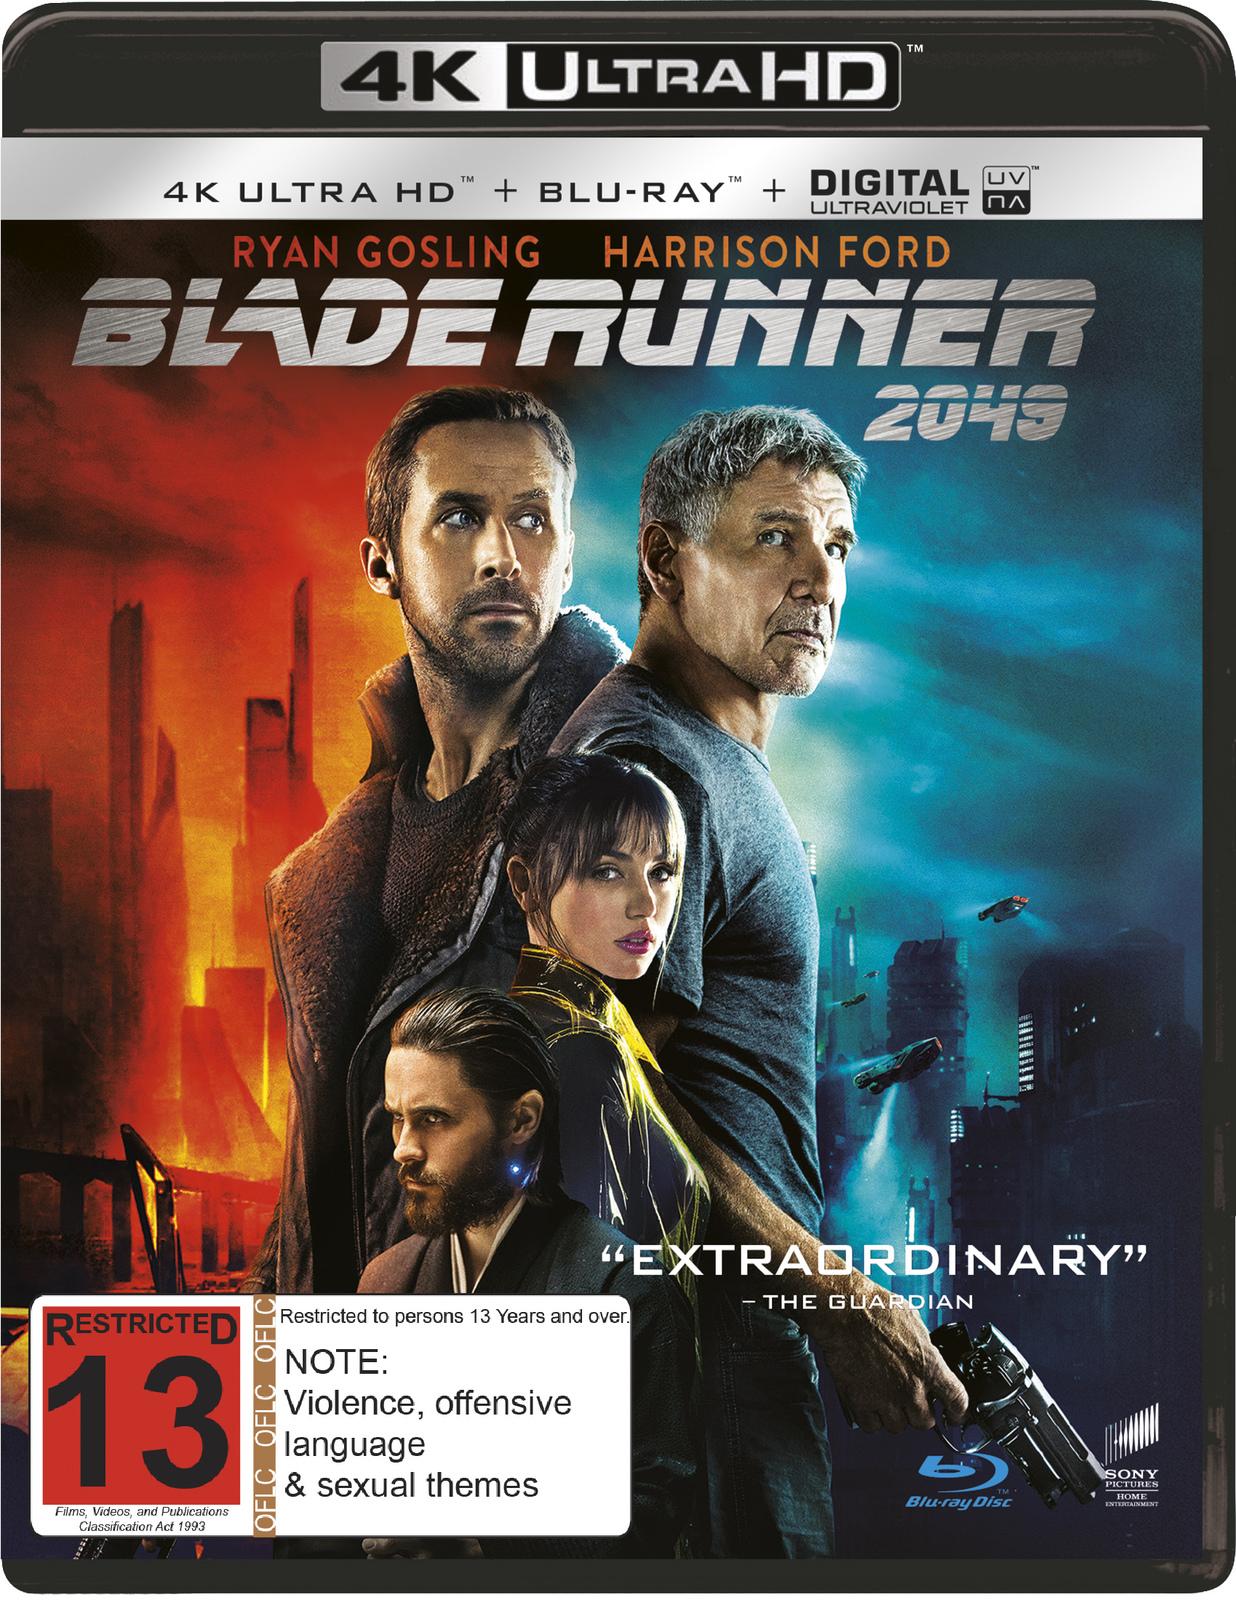 Blade Runner 2049 (4K UHD + Blu-ray) on UHD Blu-ray image